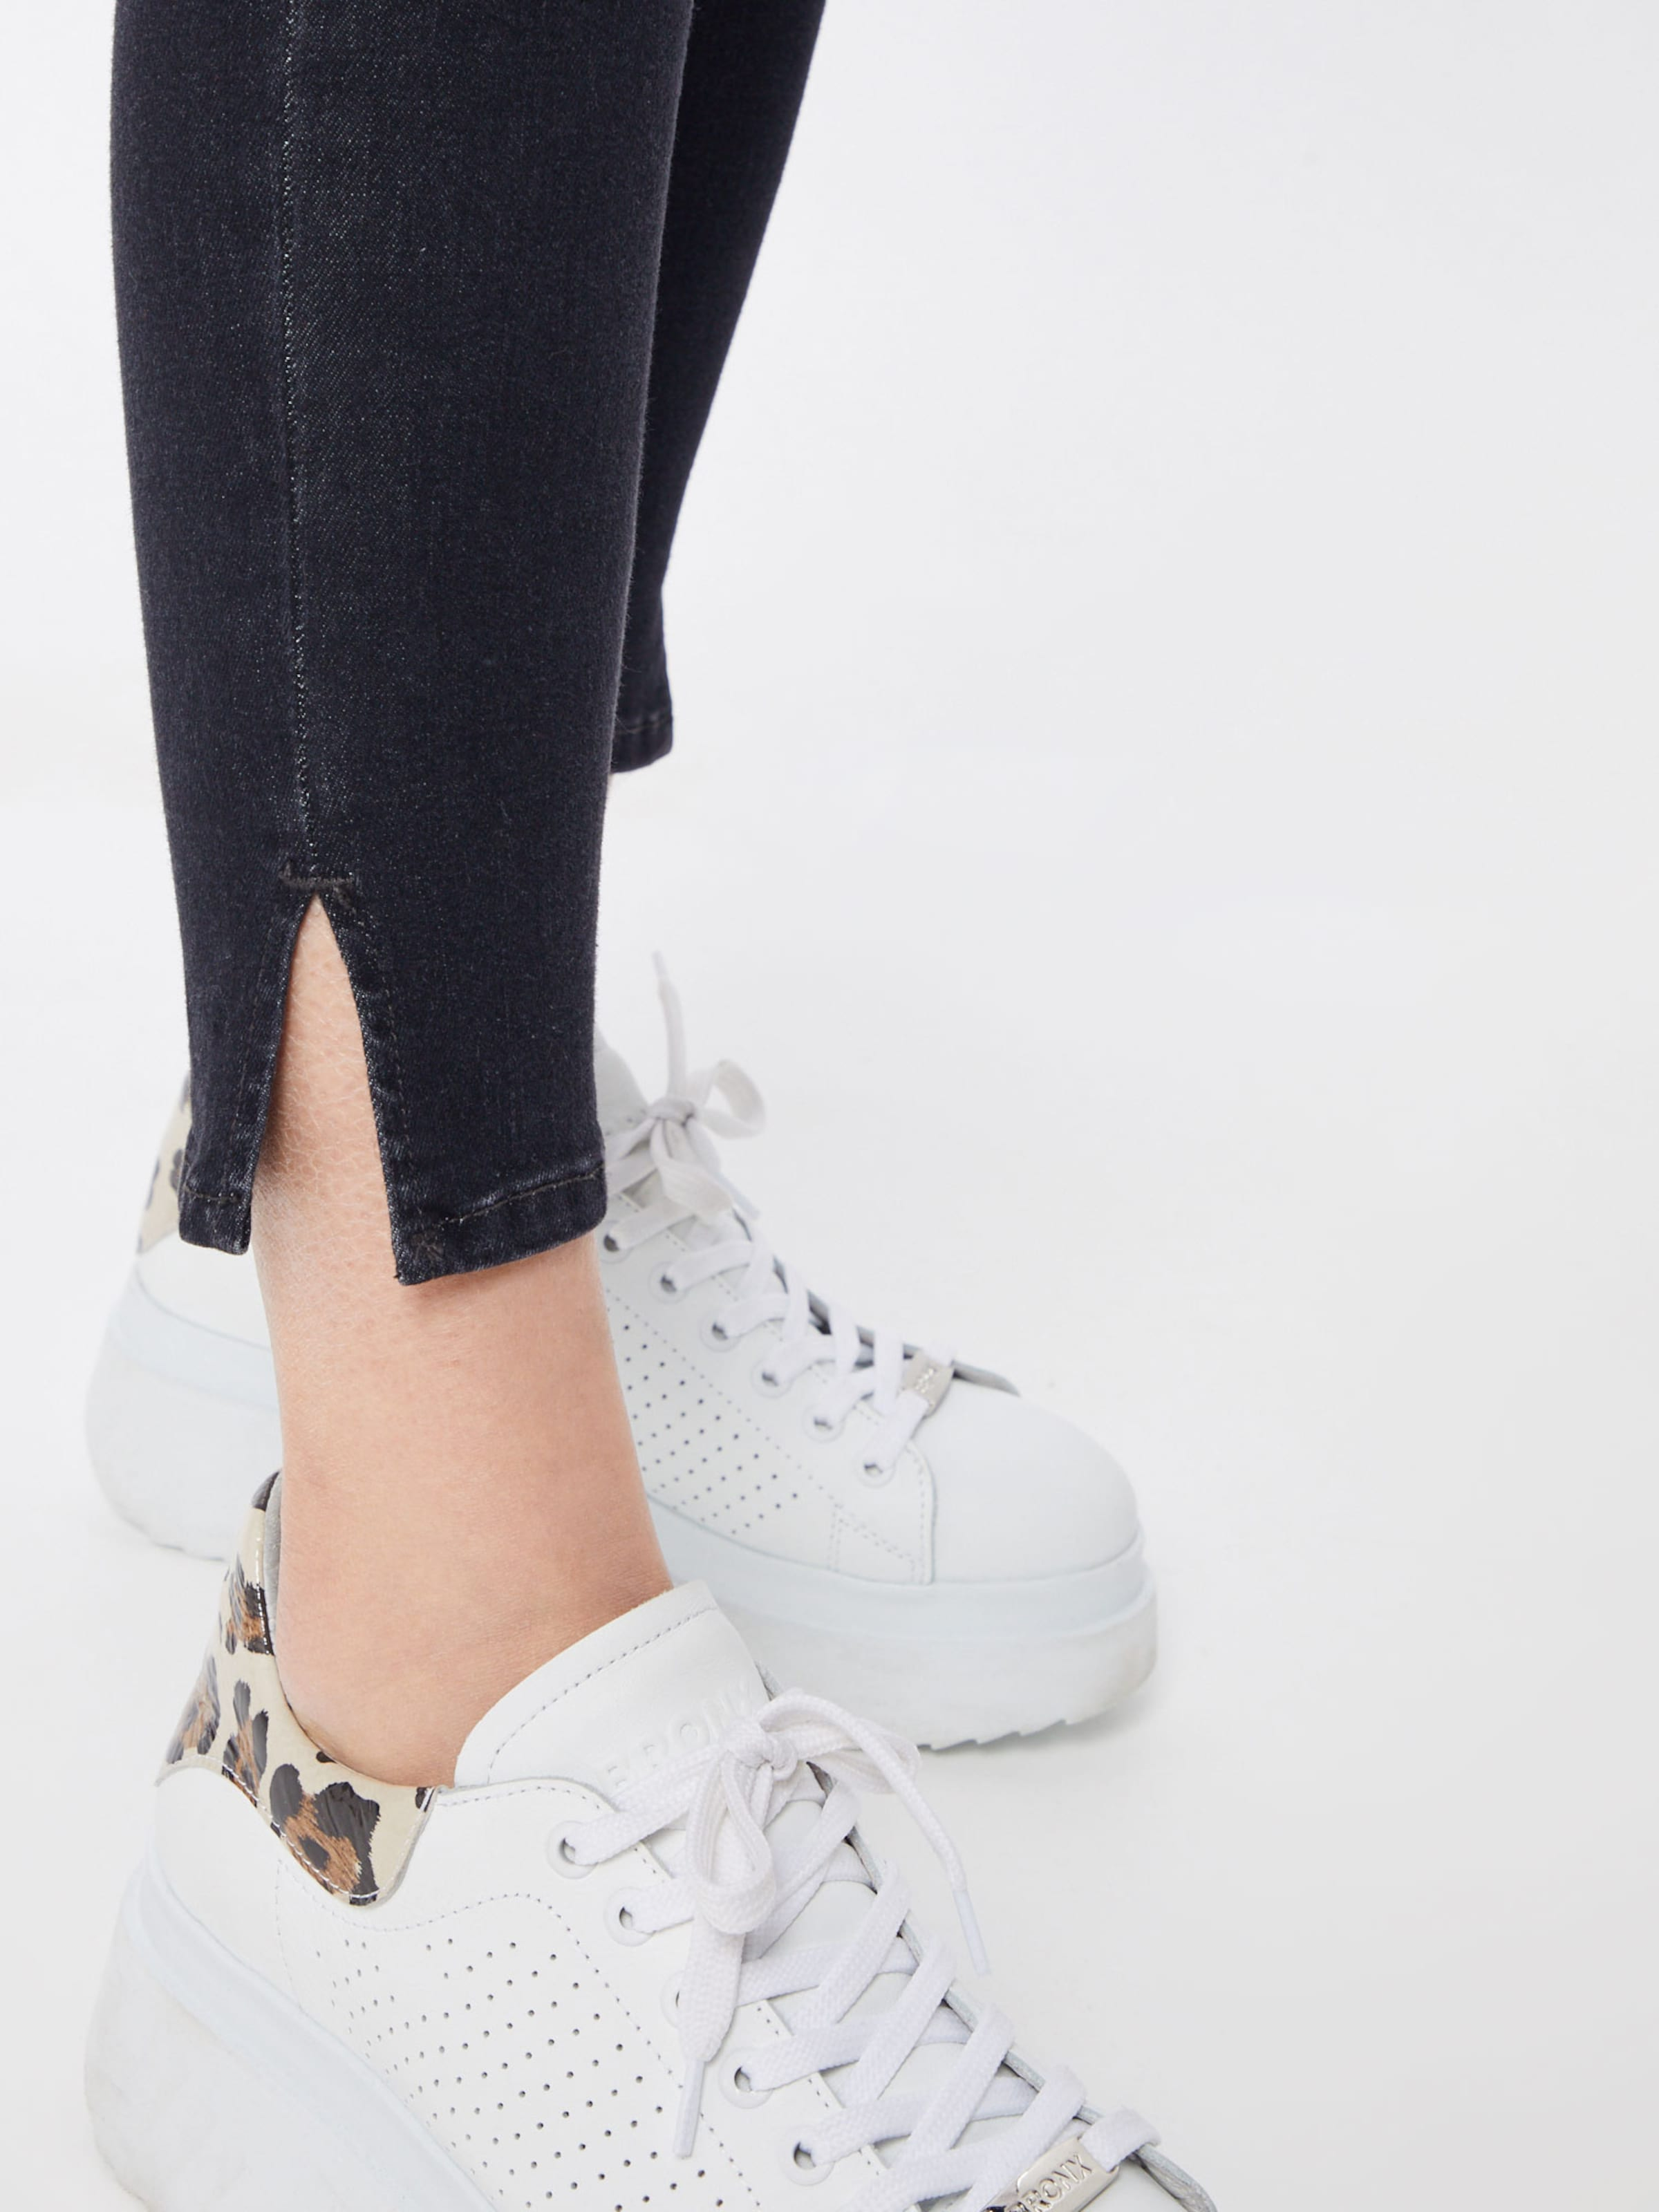 Ankle Yoke' Levi's Jean En Bleu High 'mile Denim uXZkOPi